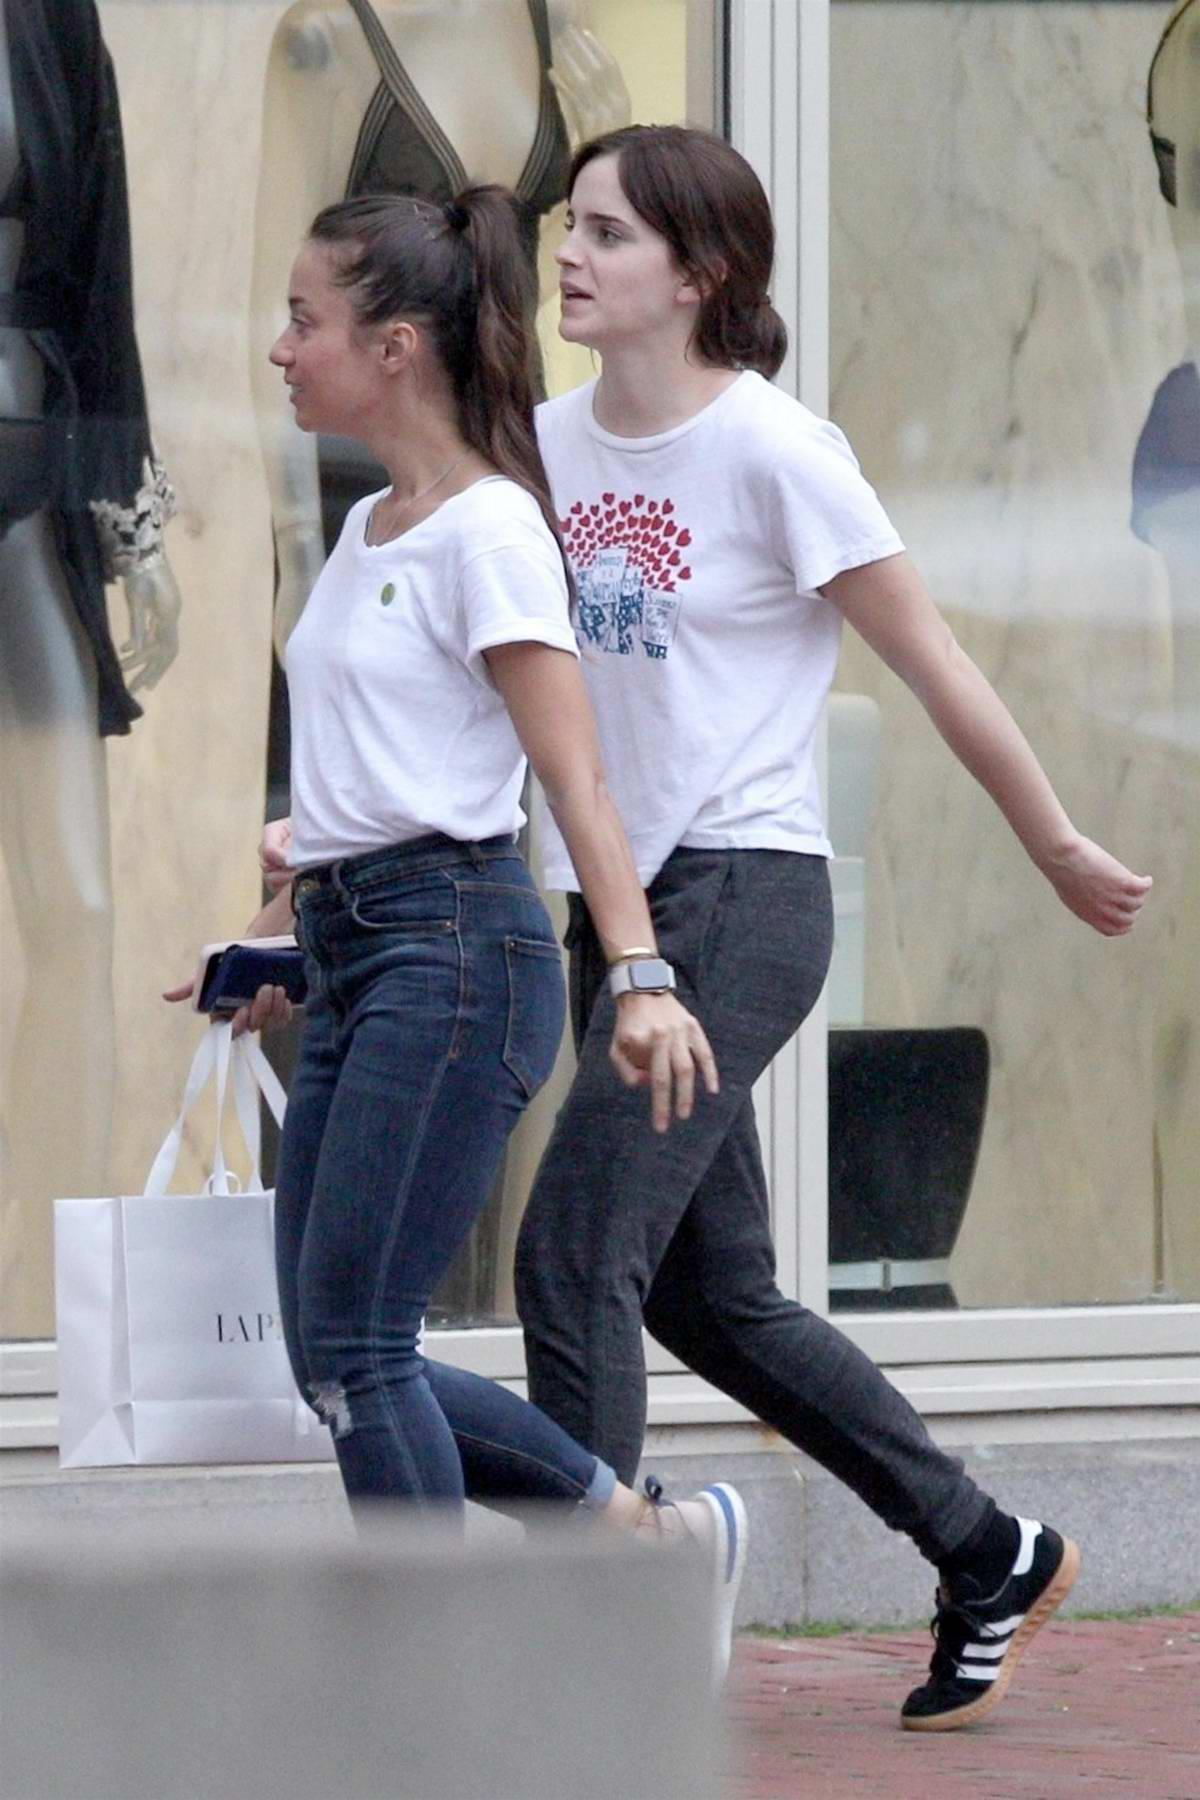 Emma Watson goes shopping at La Perla in Boston, Massachusetts